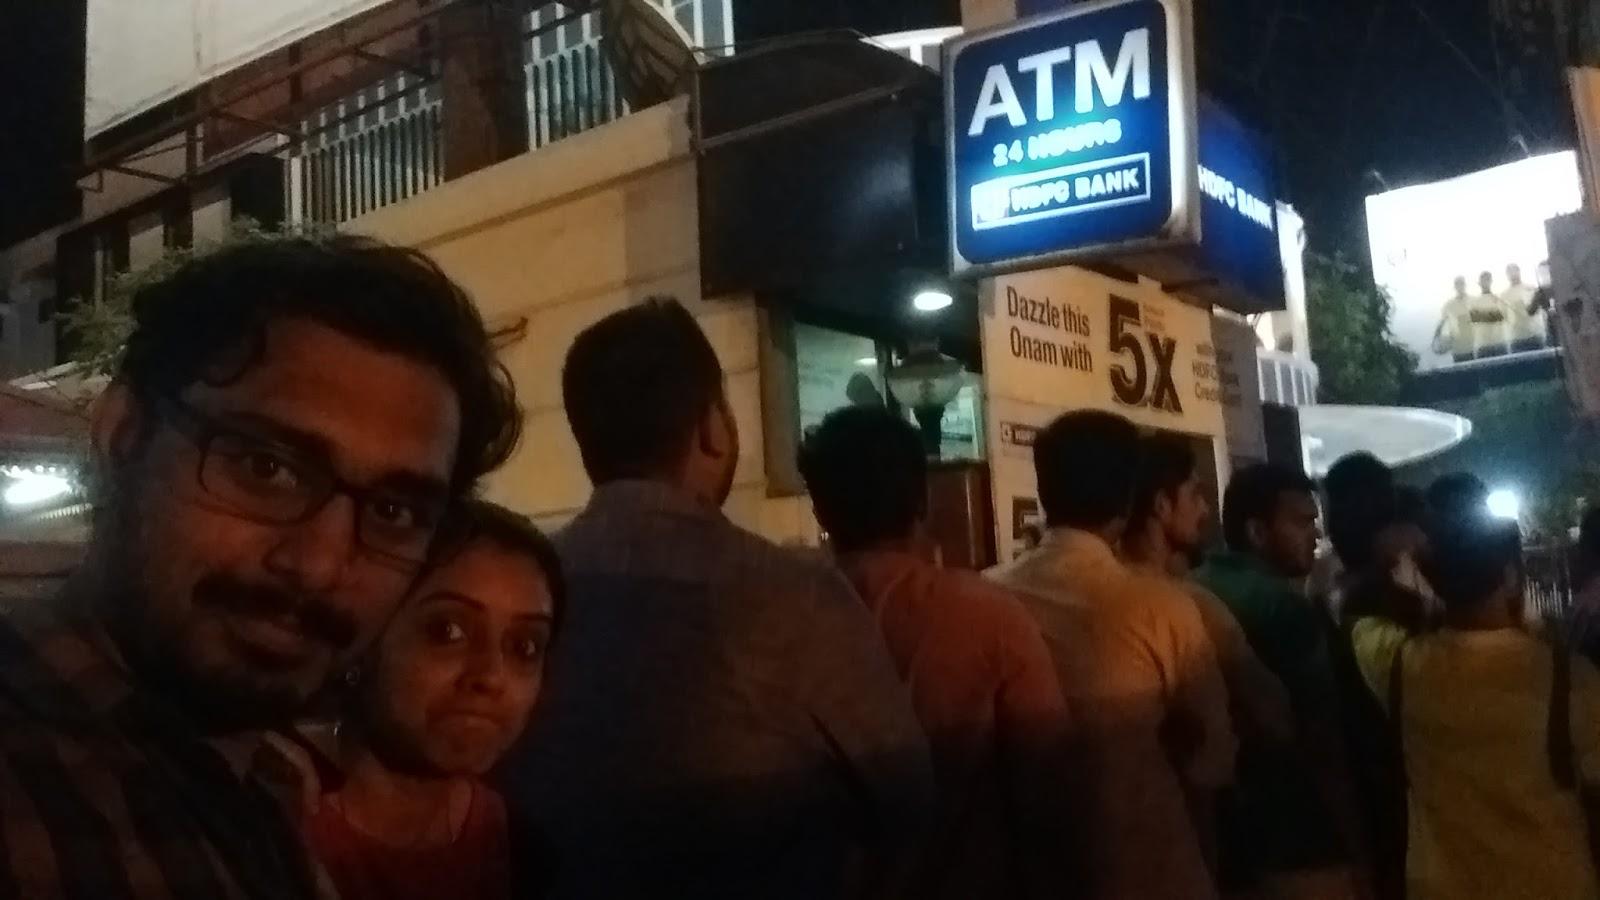 blood bank HDFC Bank ATM near Kochi Kerala